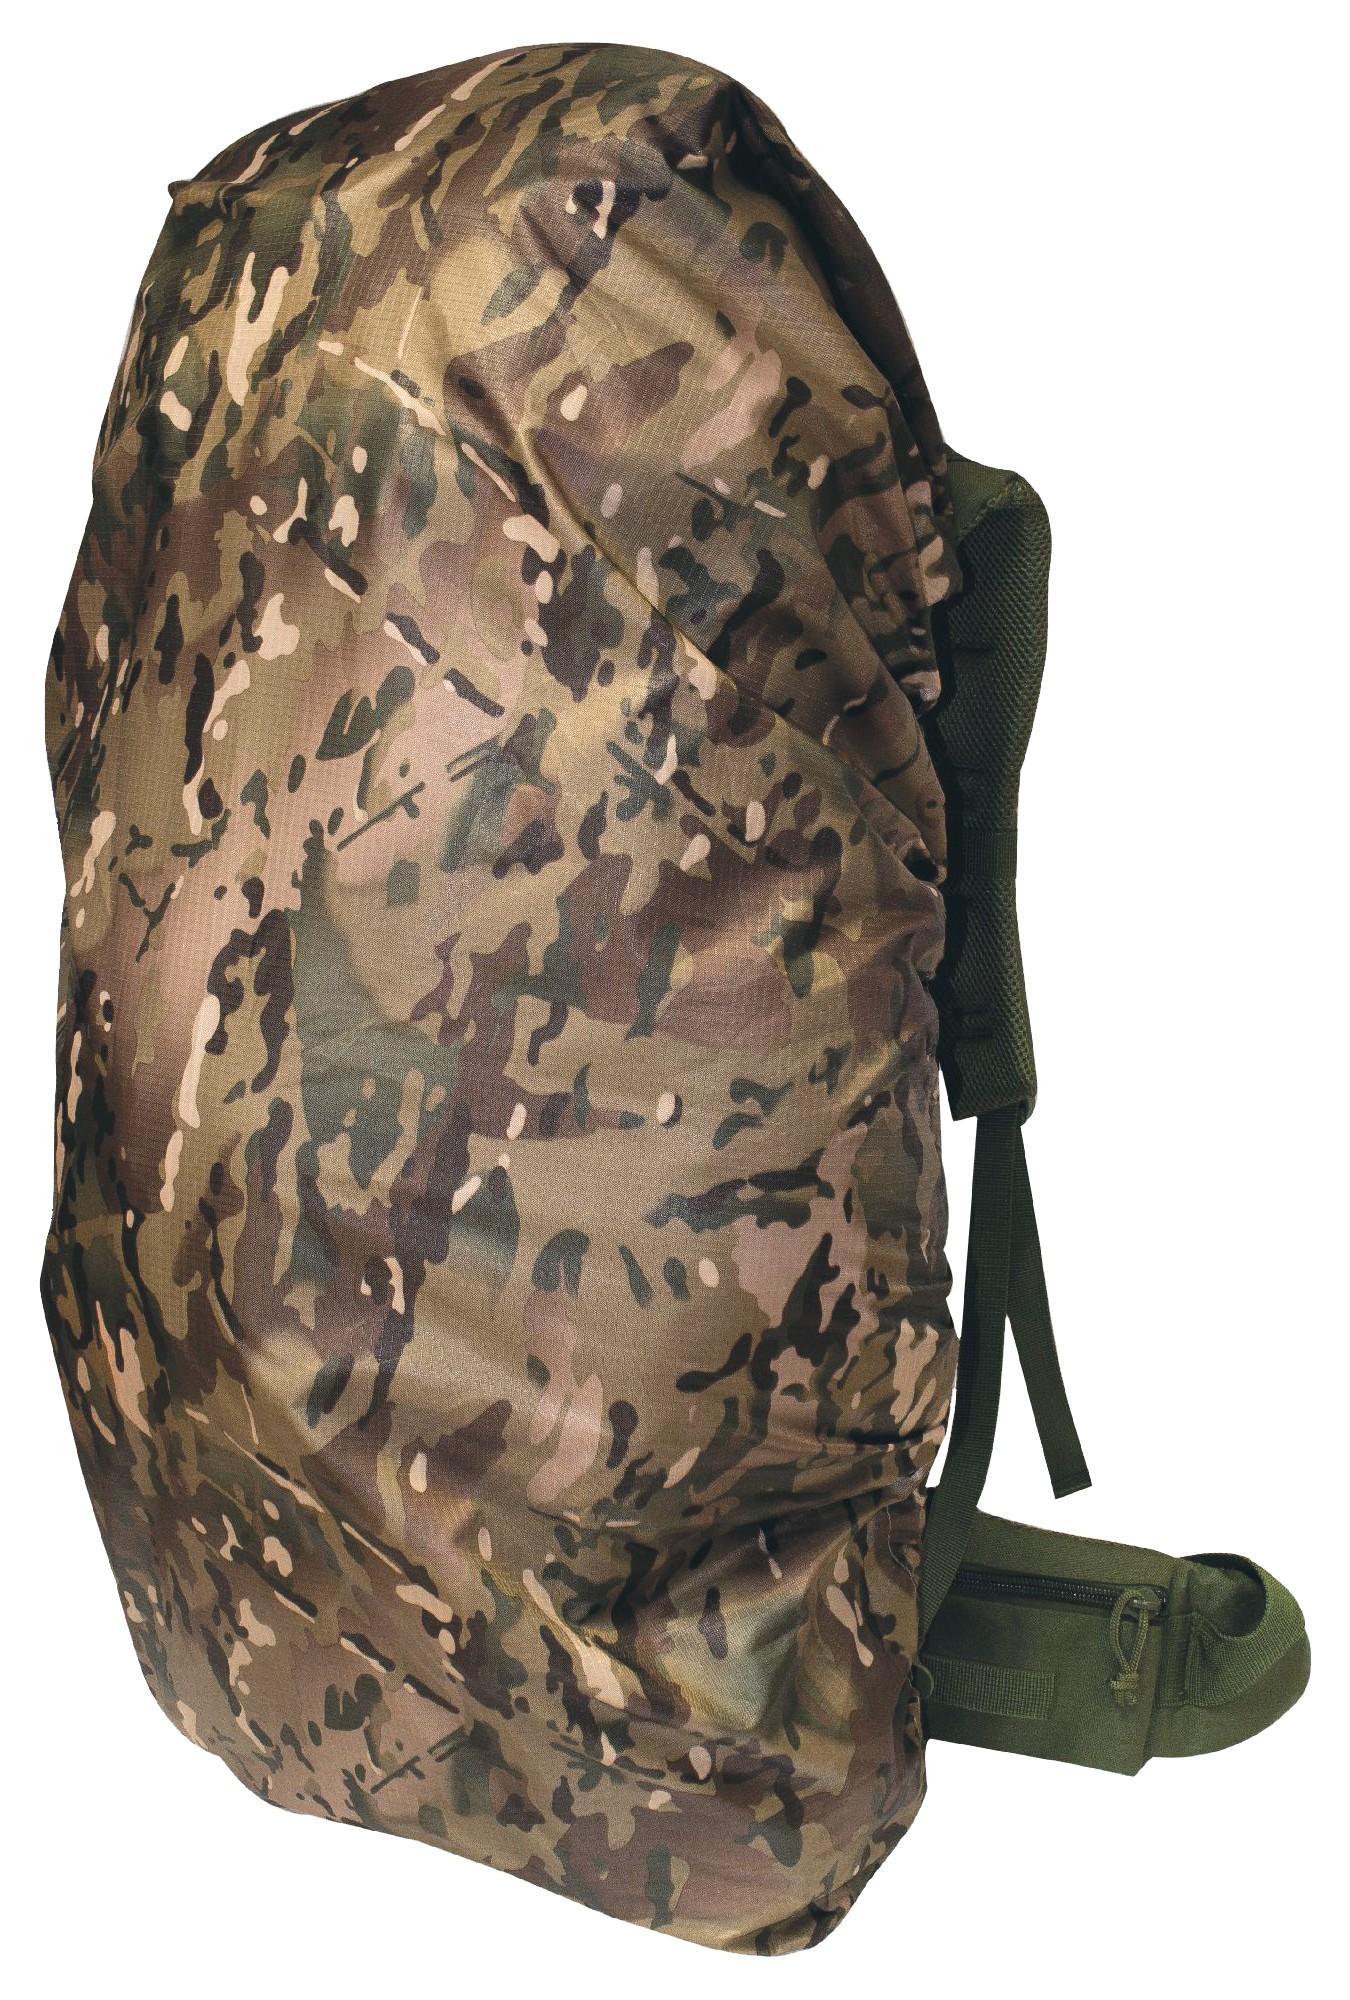 Backpack Rain Cover HMTC L